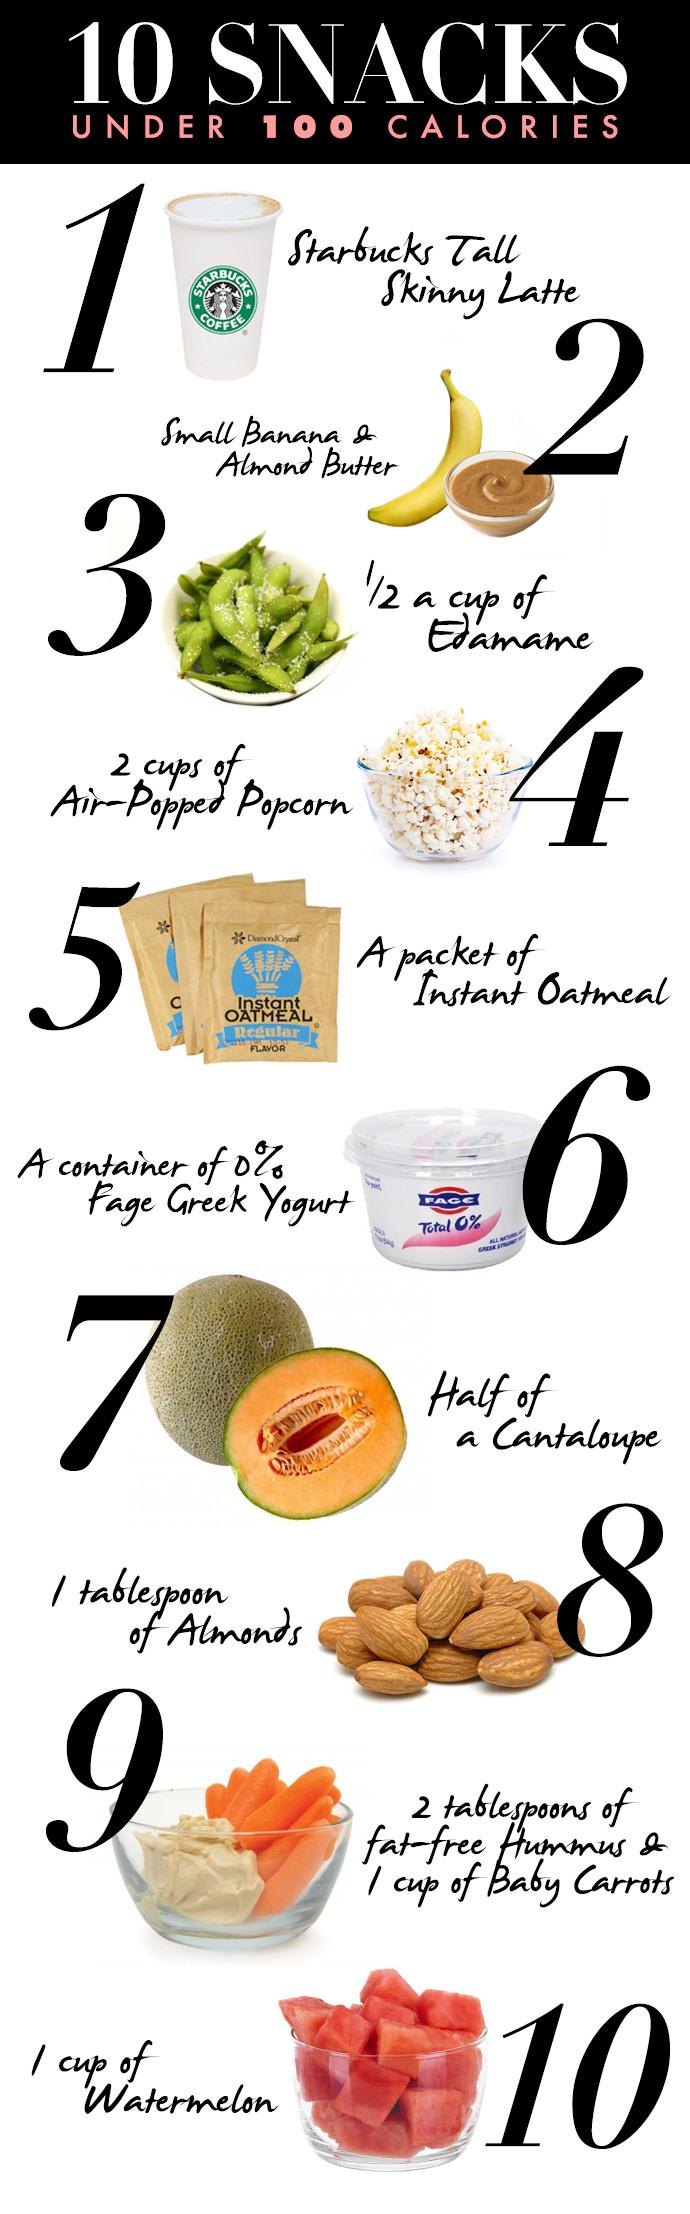 100 Calorie Snacks List  10 Healthy Snacks Under 100 Calories